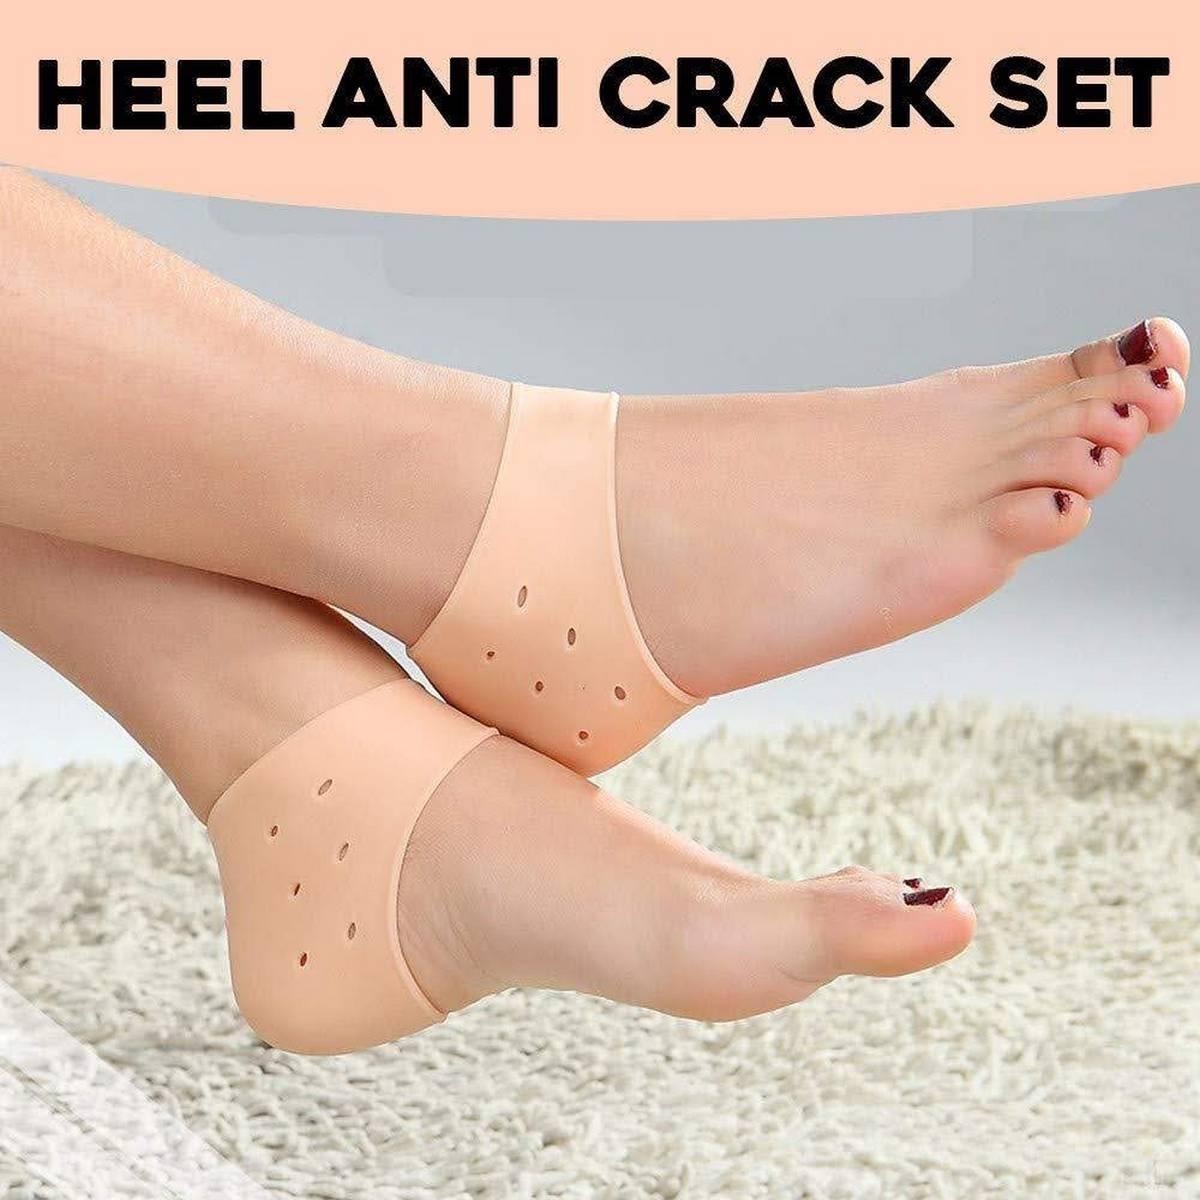 Anti Heel Crack Pads Heel Protectors Set for Pain Relief, Silicone Half Heel Anti Crack Covers For Girls / Women Lowest Price in Pakistan